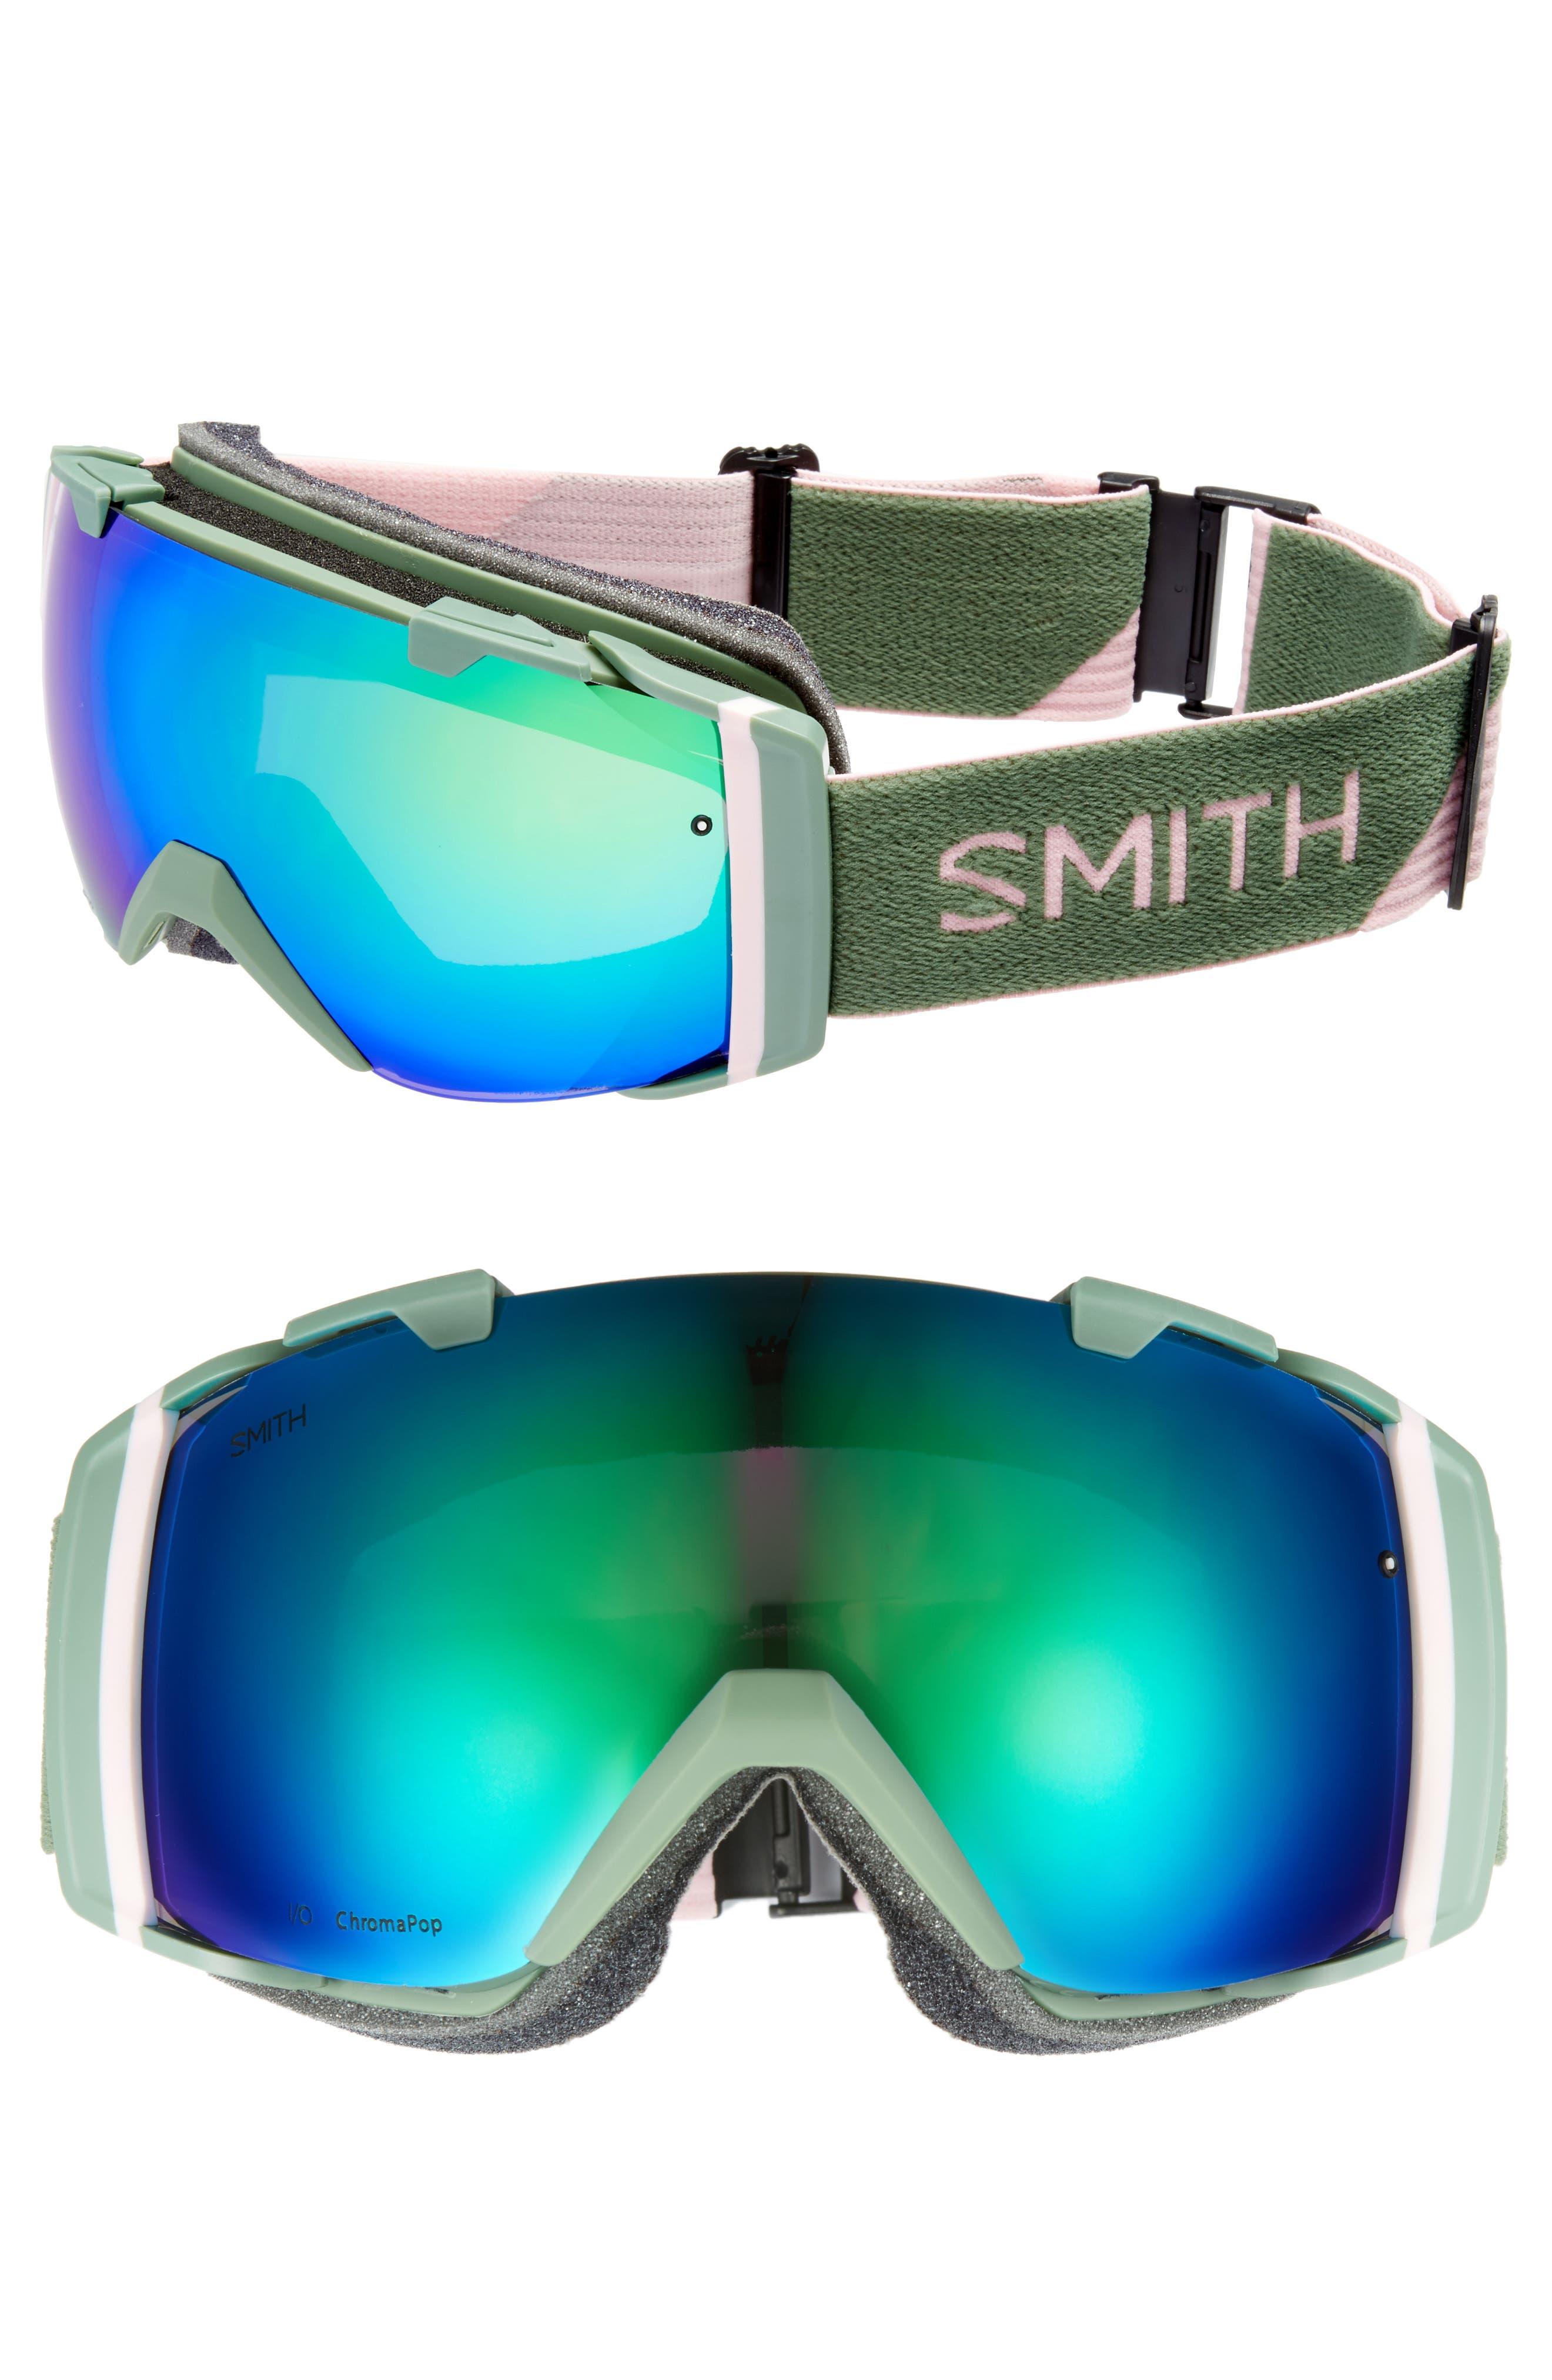 I/O 180mm Snow/Ski Goggles,                             Main thumbnail 1, color,                             Patina Split/ Mirror